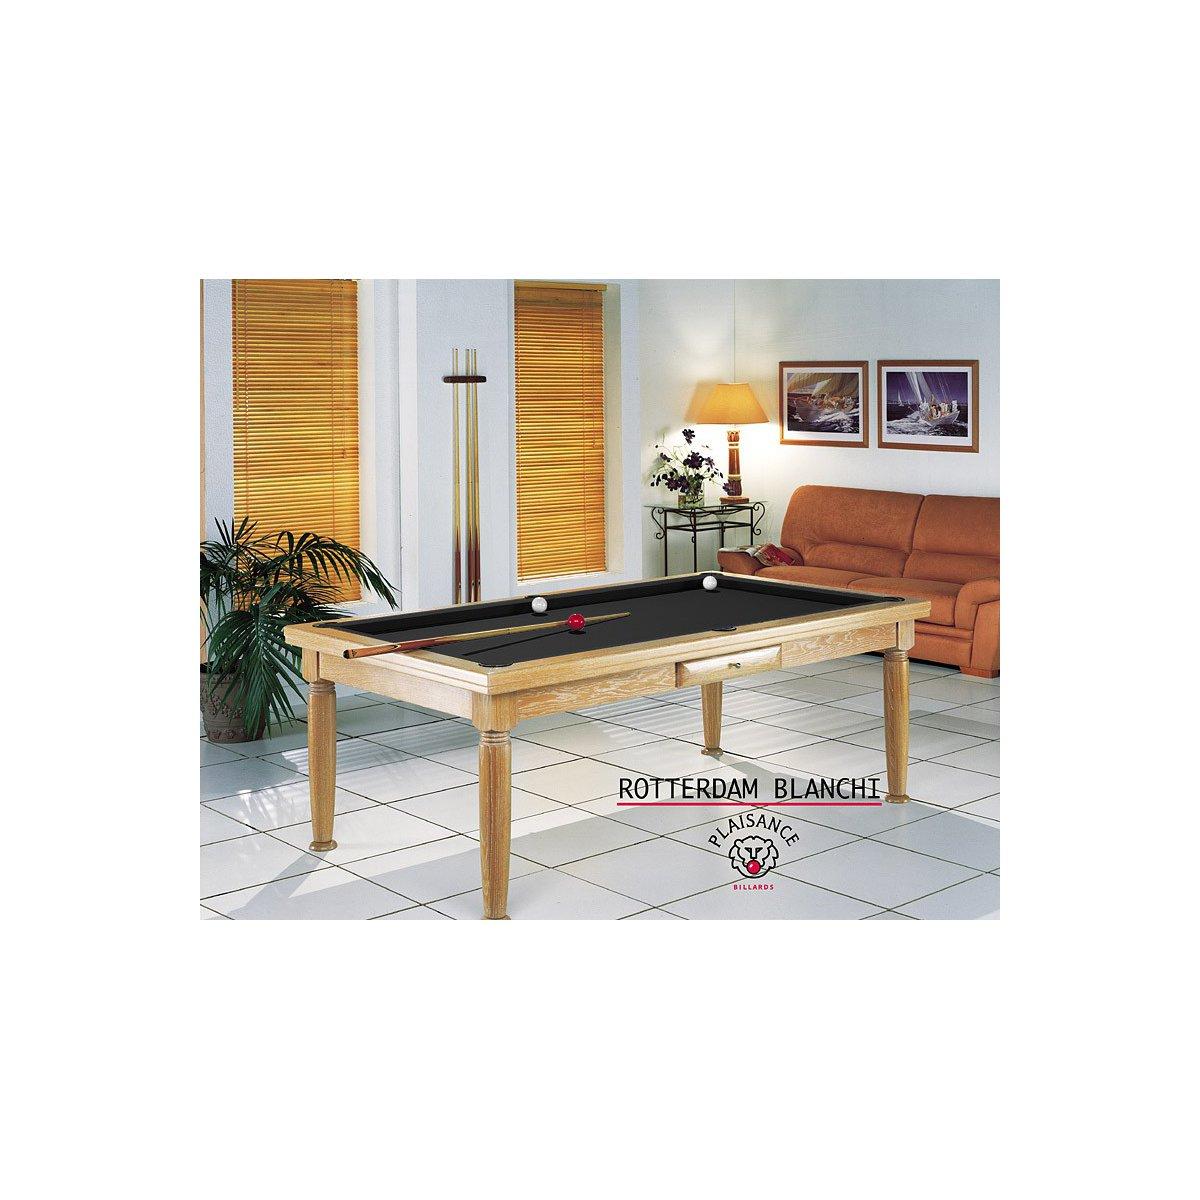 Table manger haut de gamme stunning lgante broderie for Meuble de salle a manger haut de gamme